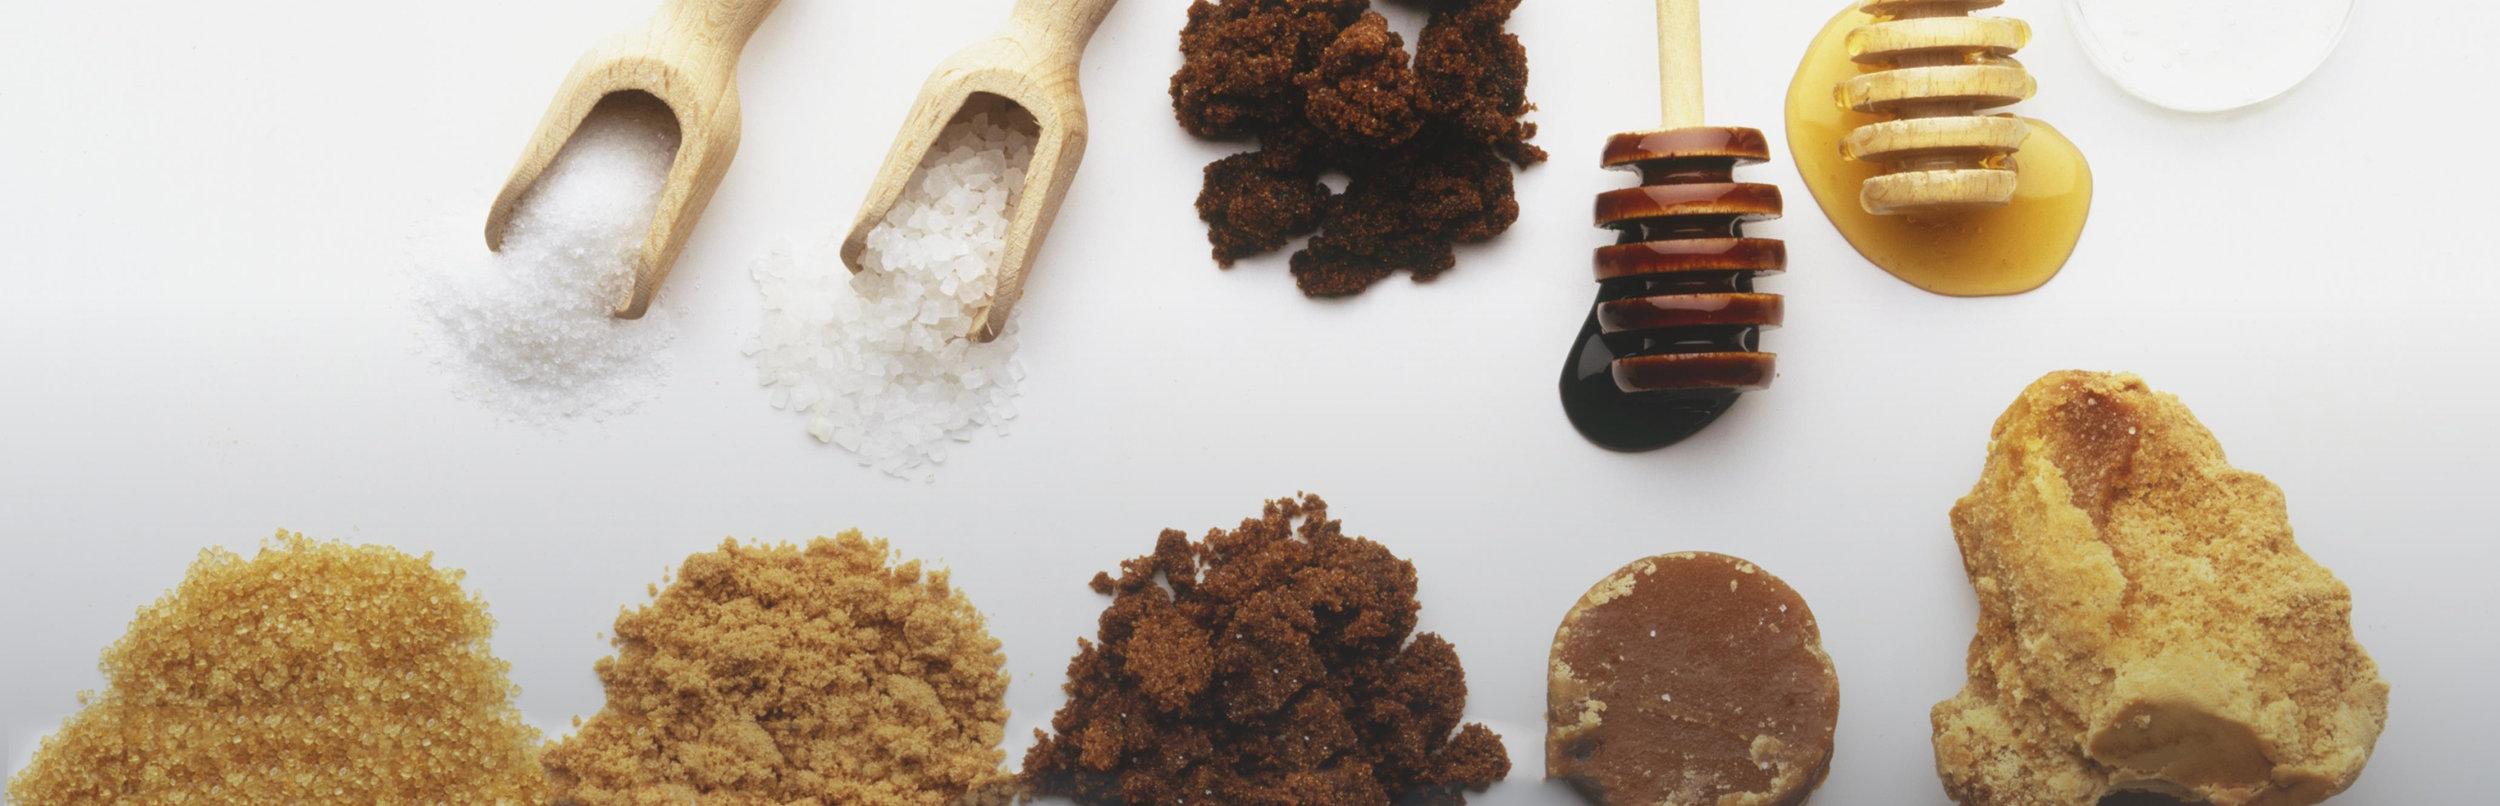 Stevia // coconut sugar // raw cane sugar // agave // brown sugar // white sugar // sweeteners.Image via Furthermore from Equinox.